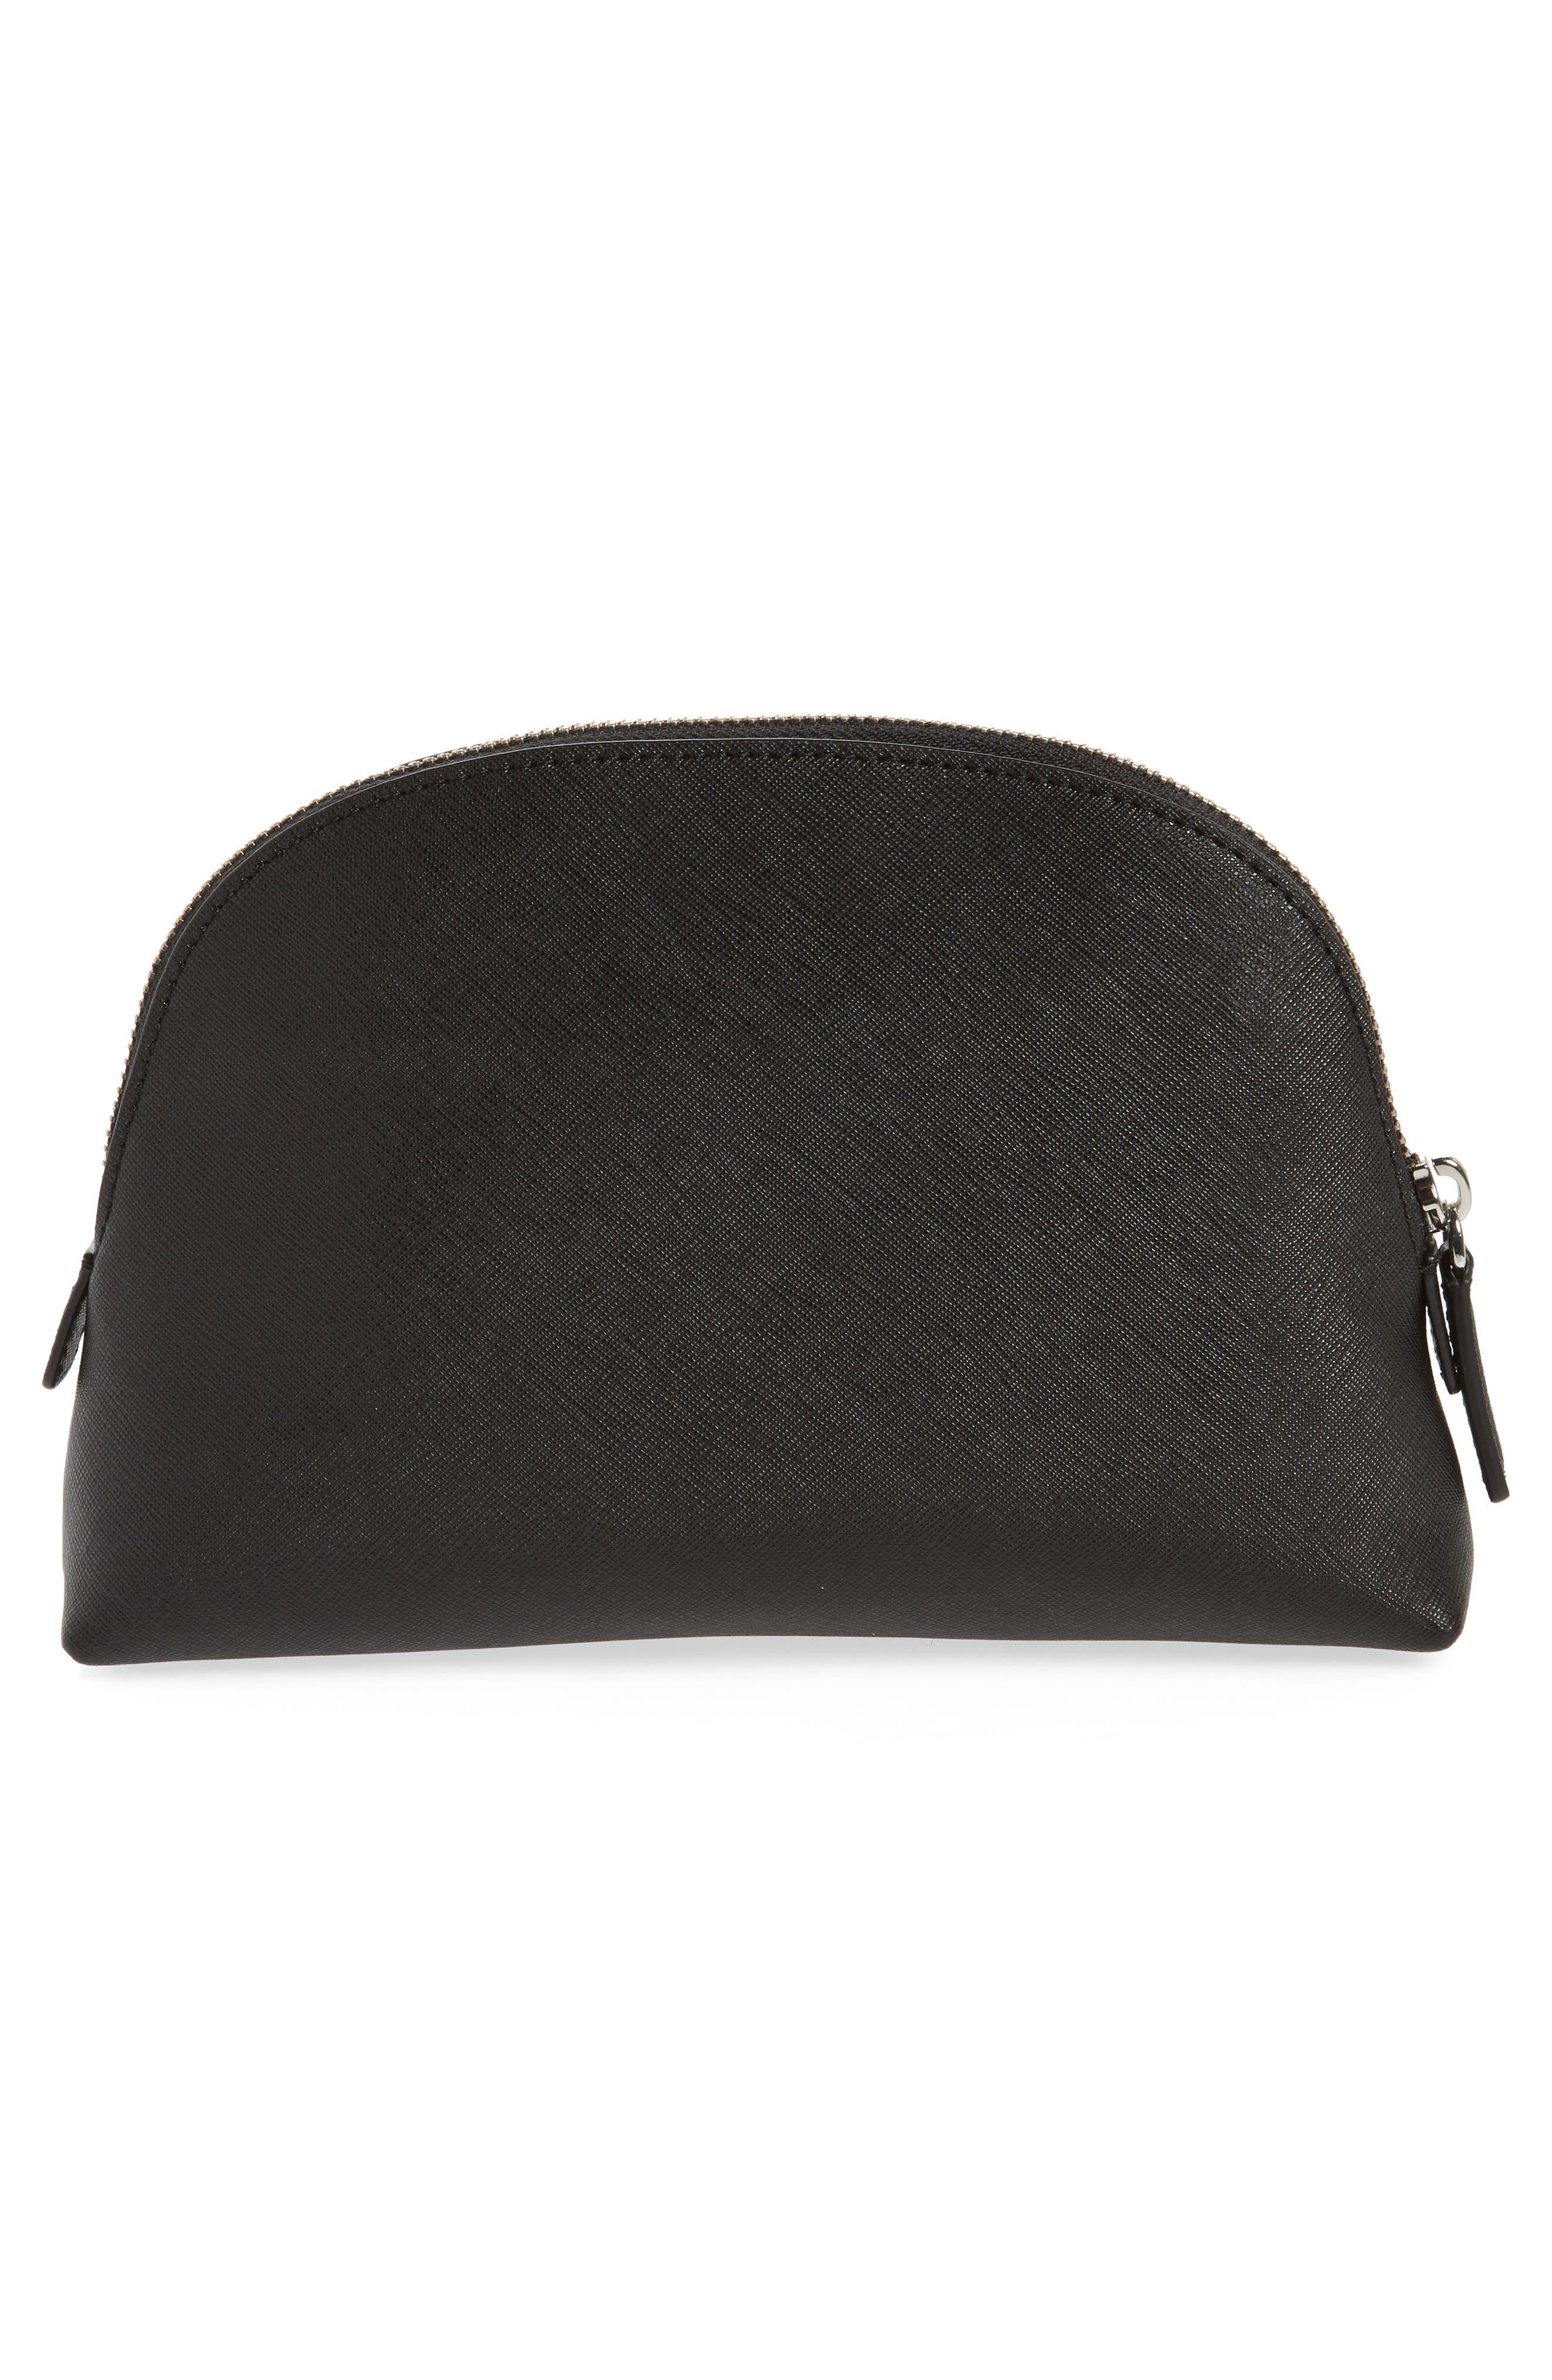 Alternate Image 2  - MARC JACOBS Logo Embossed Leather Cosmetics Bag